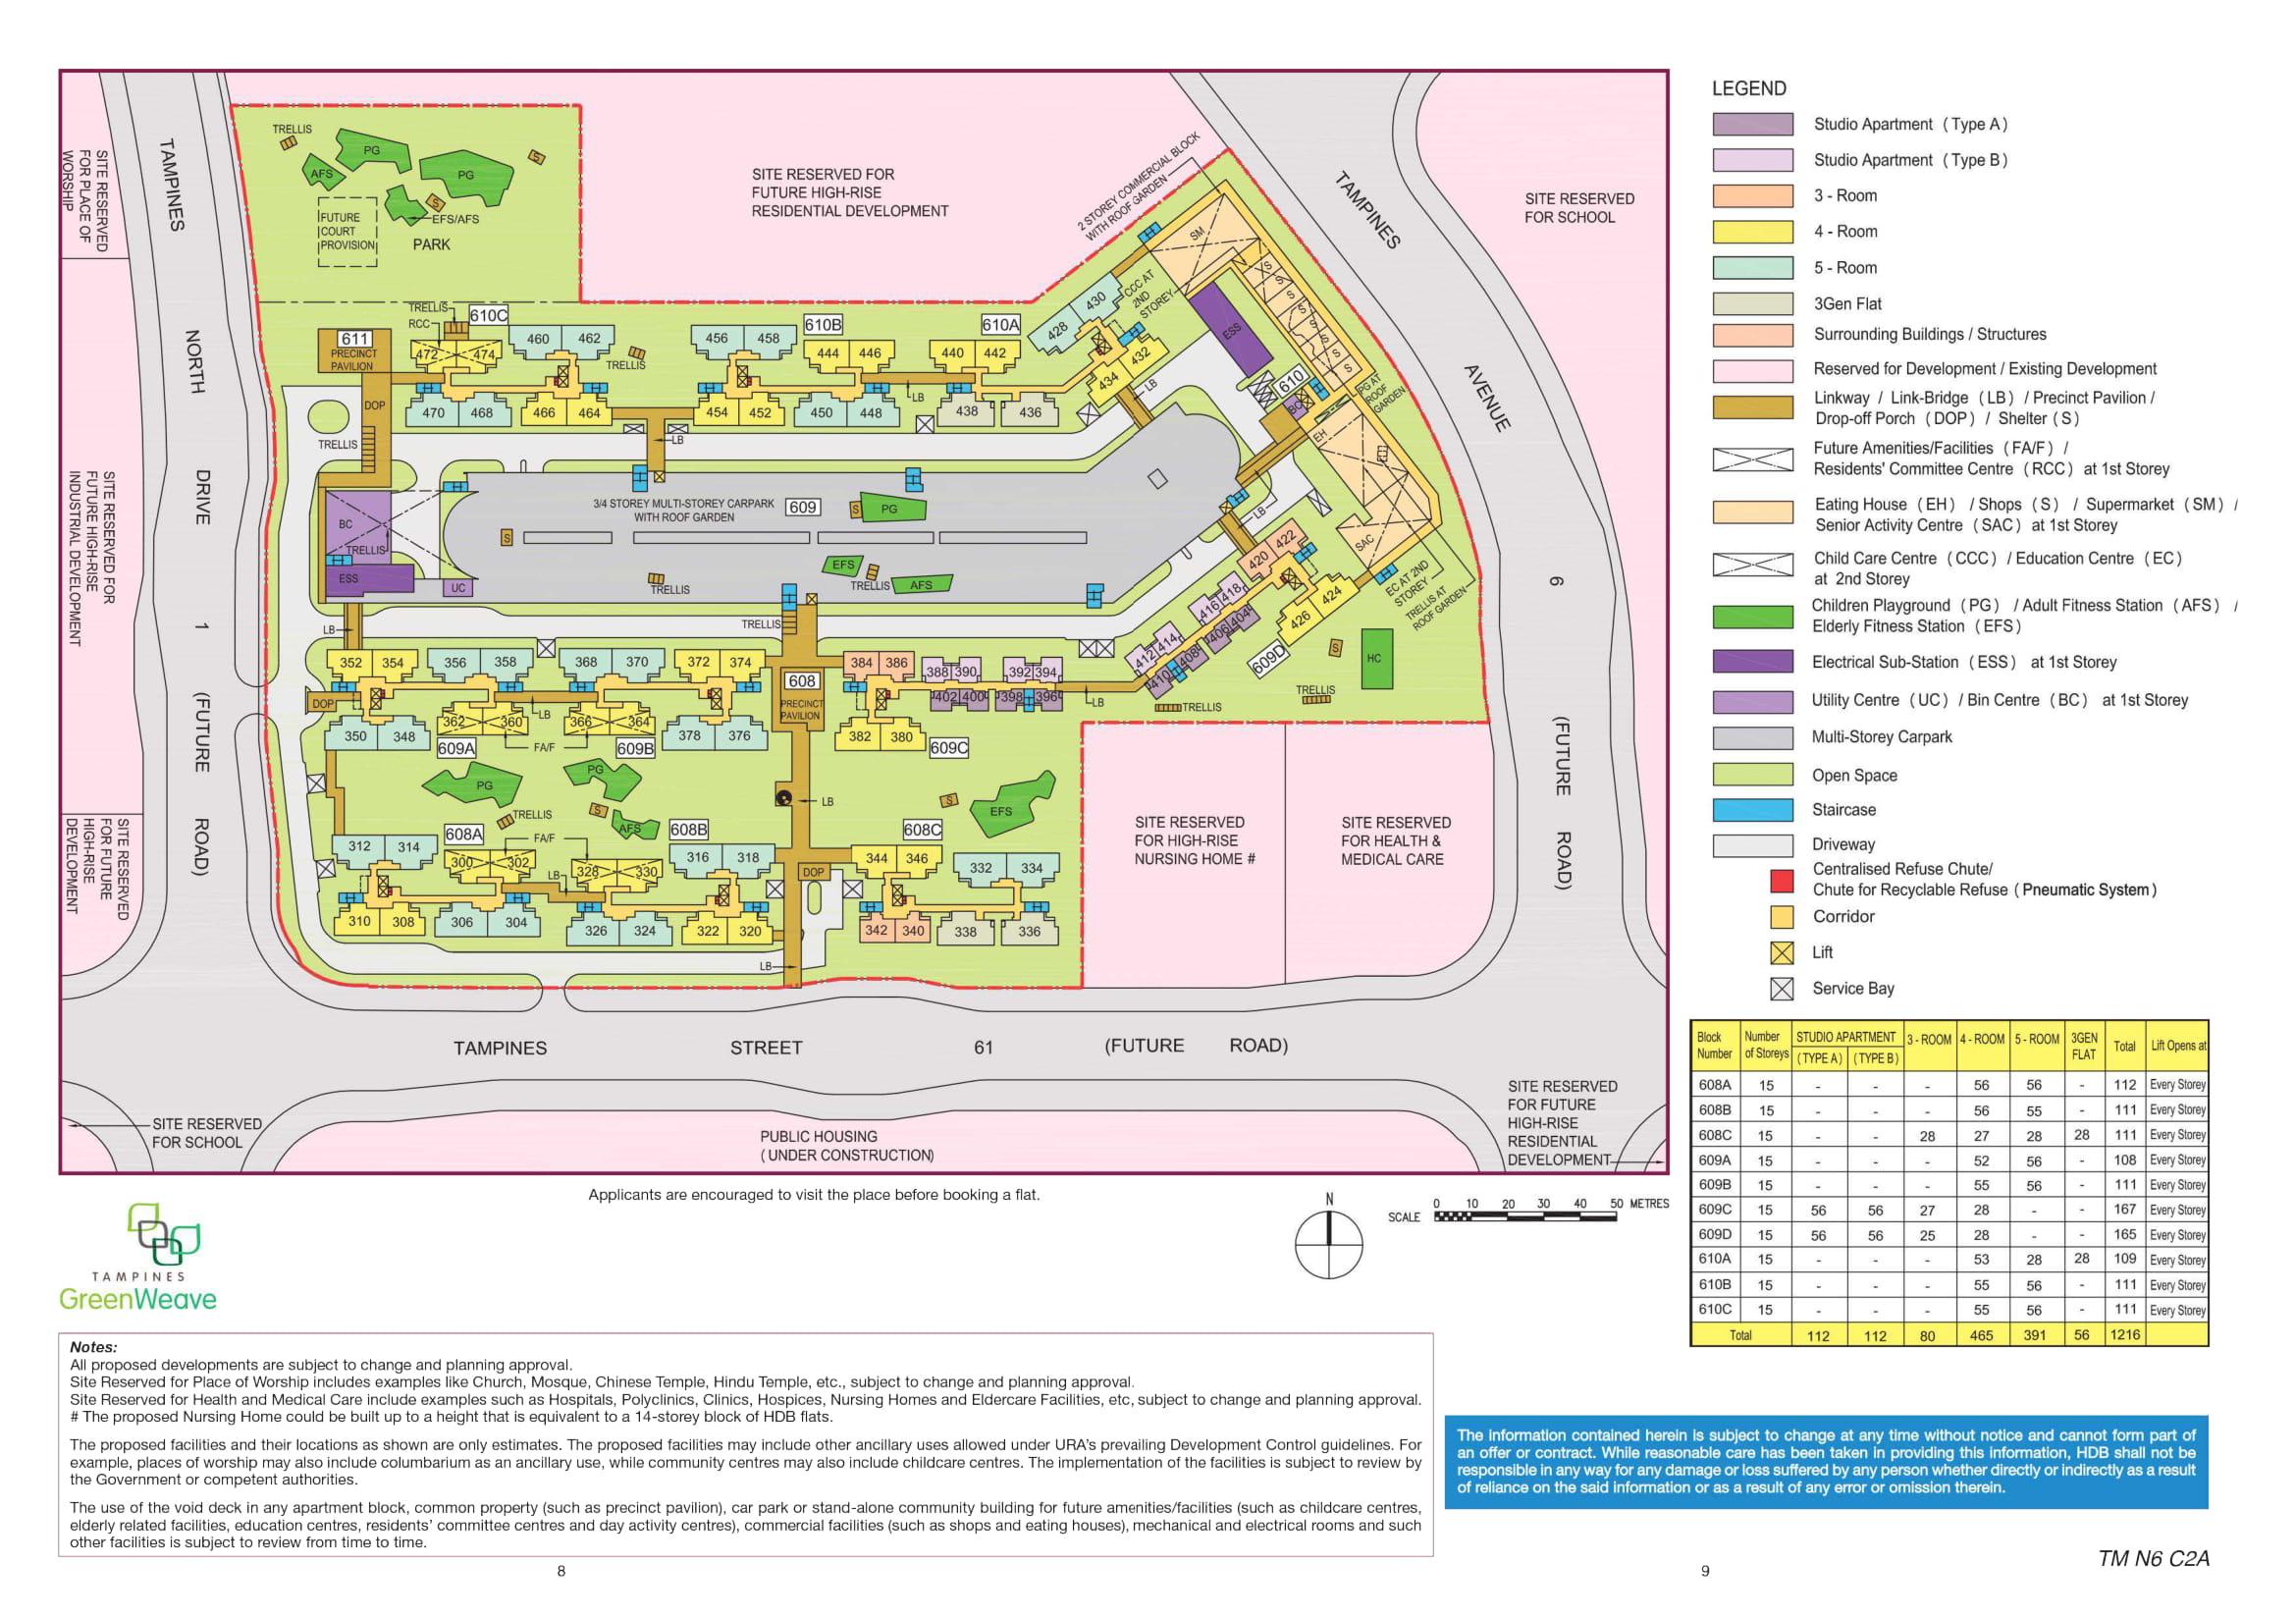 Tampines Greenweave Site Plan